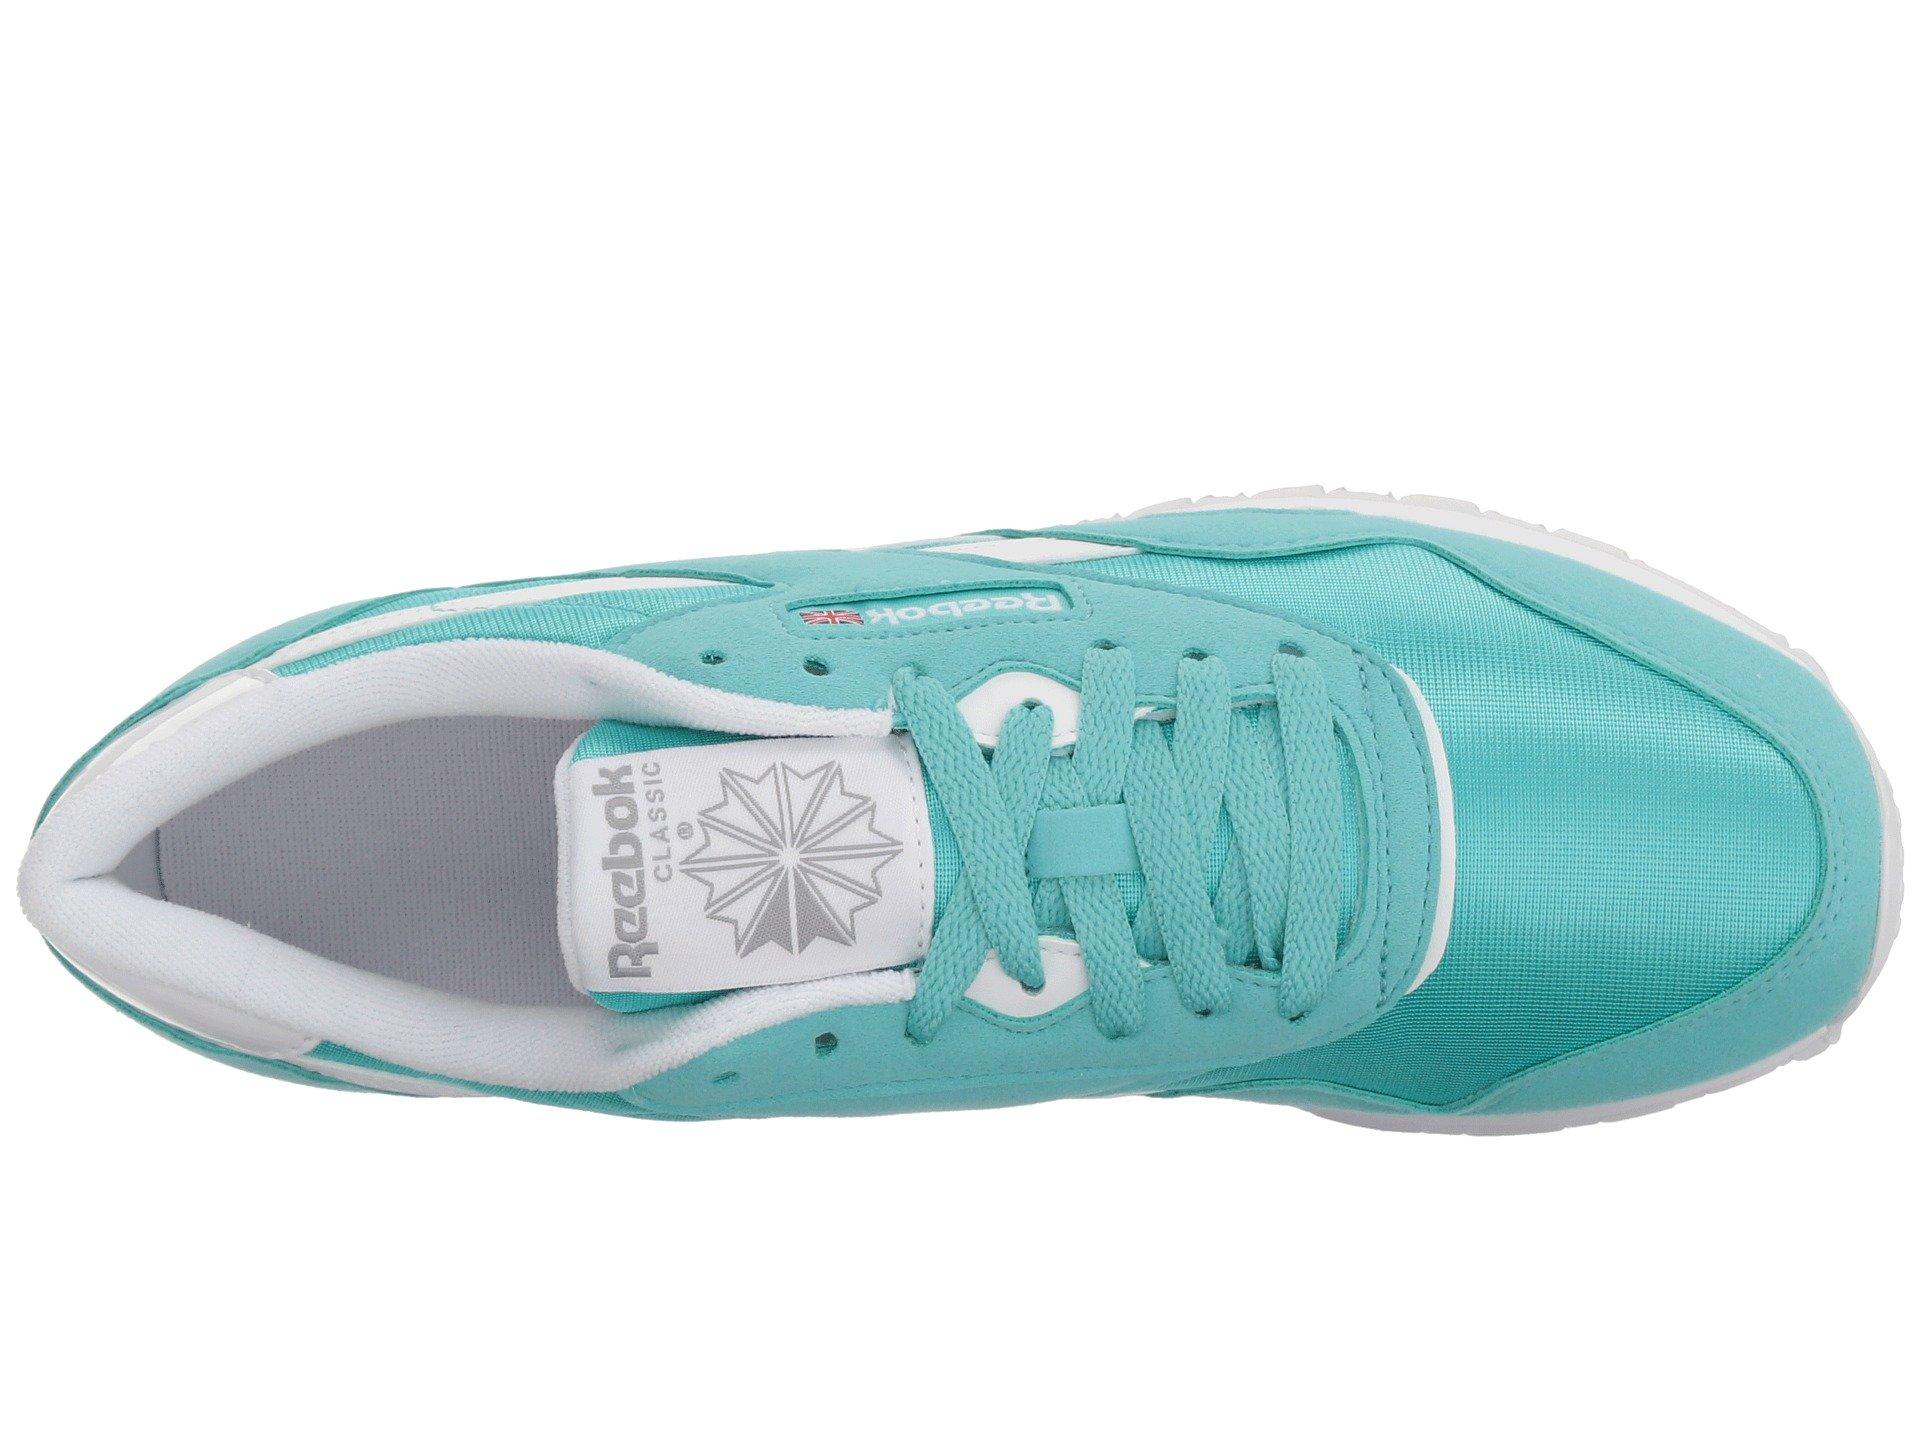 Grey stark white Brights Nylon Turquoise Reebok Lifestyle Classic gxYq7wf80